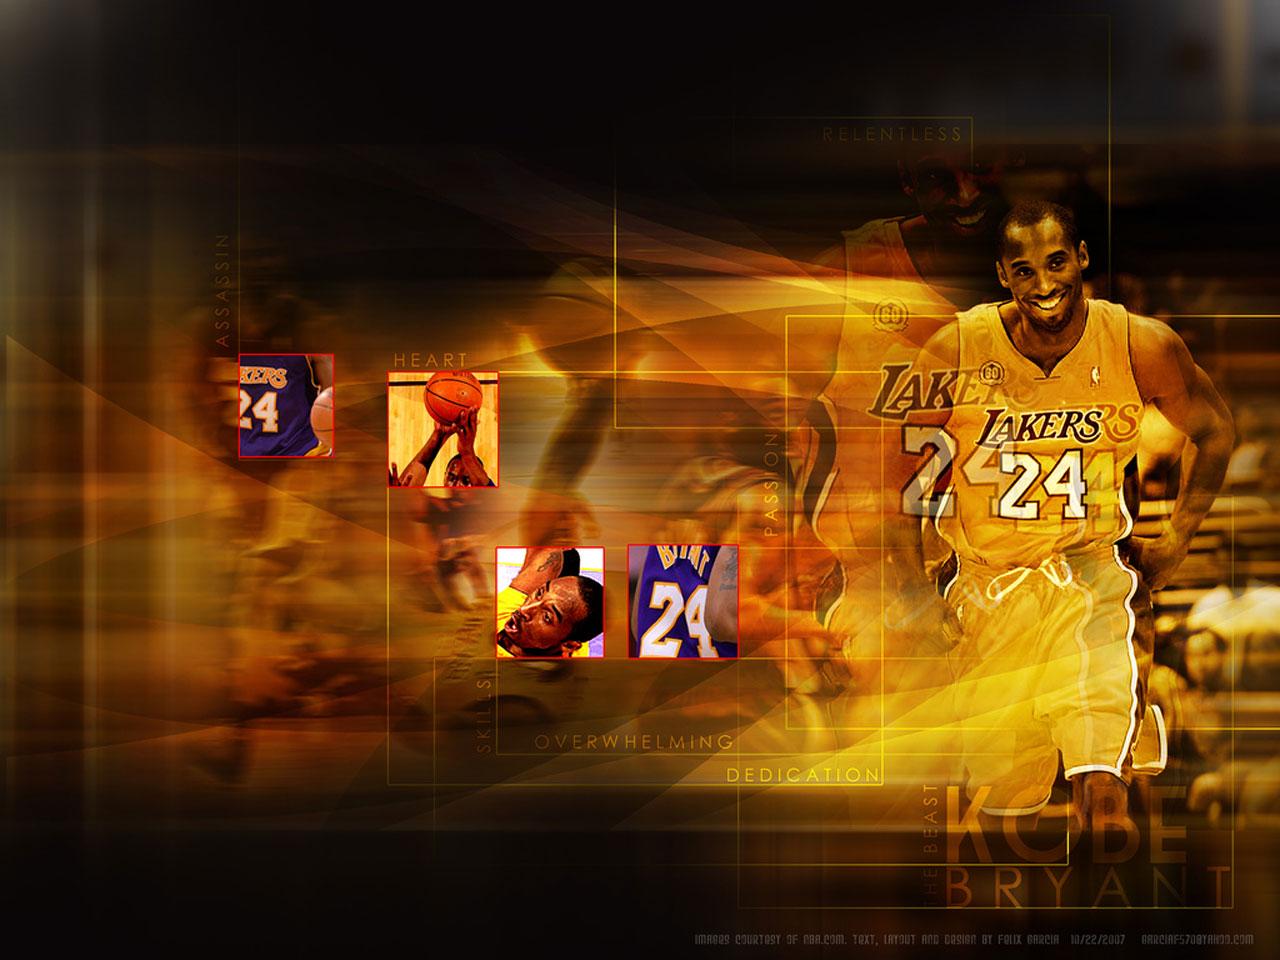 Best Kobe Bryant Wallpapers: KOBE BRYANT HD PICTURES